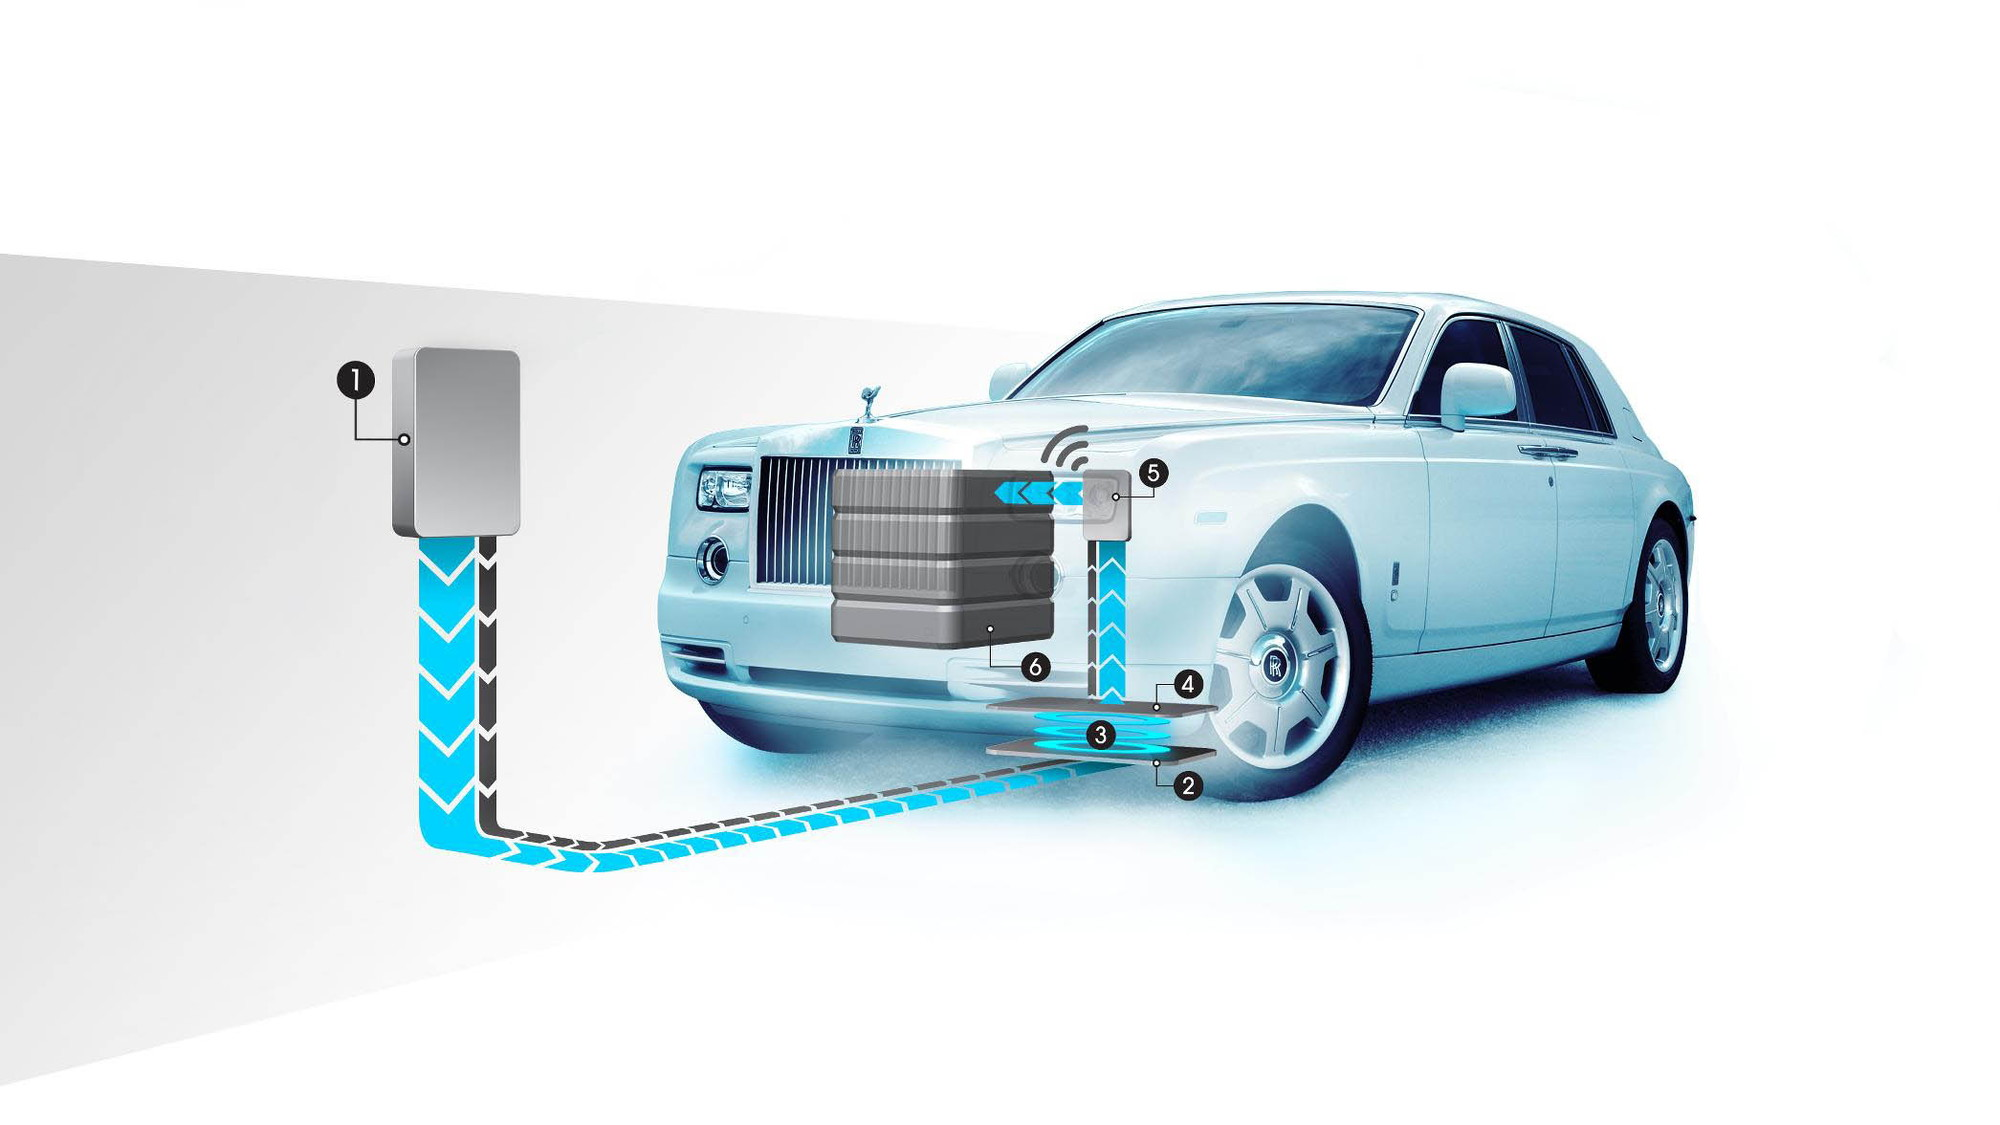 Rolls Royce Phantom Experimental Electric 102EX